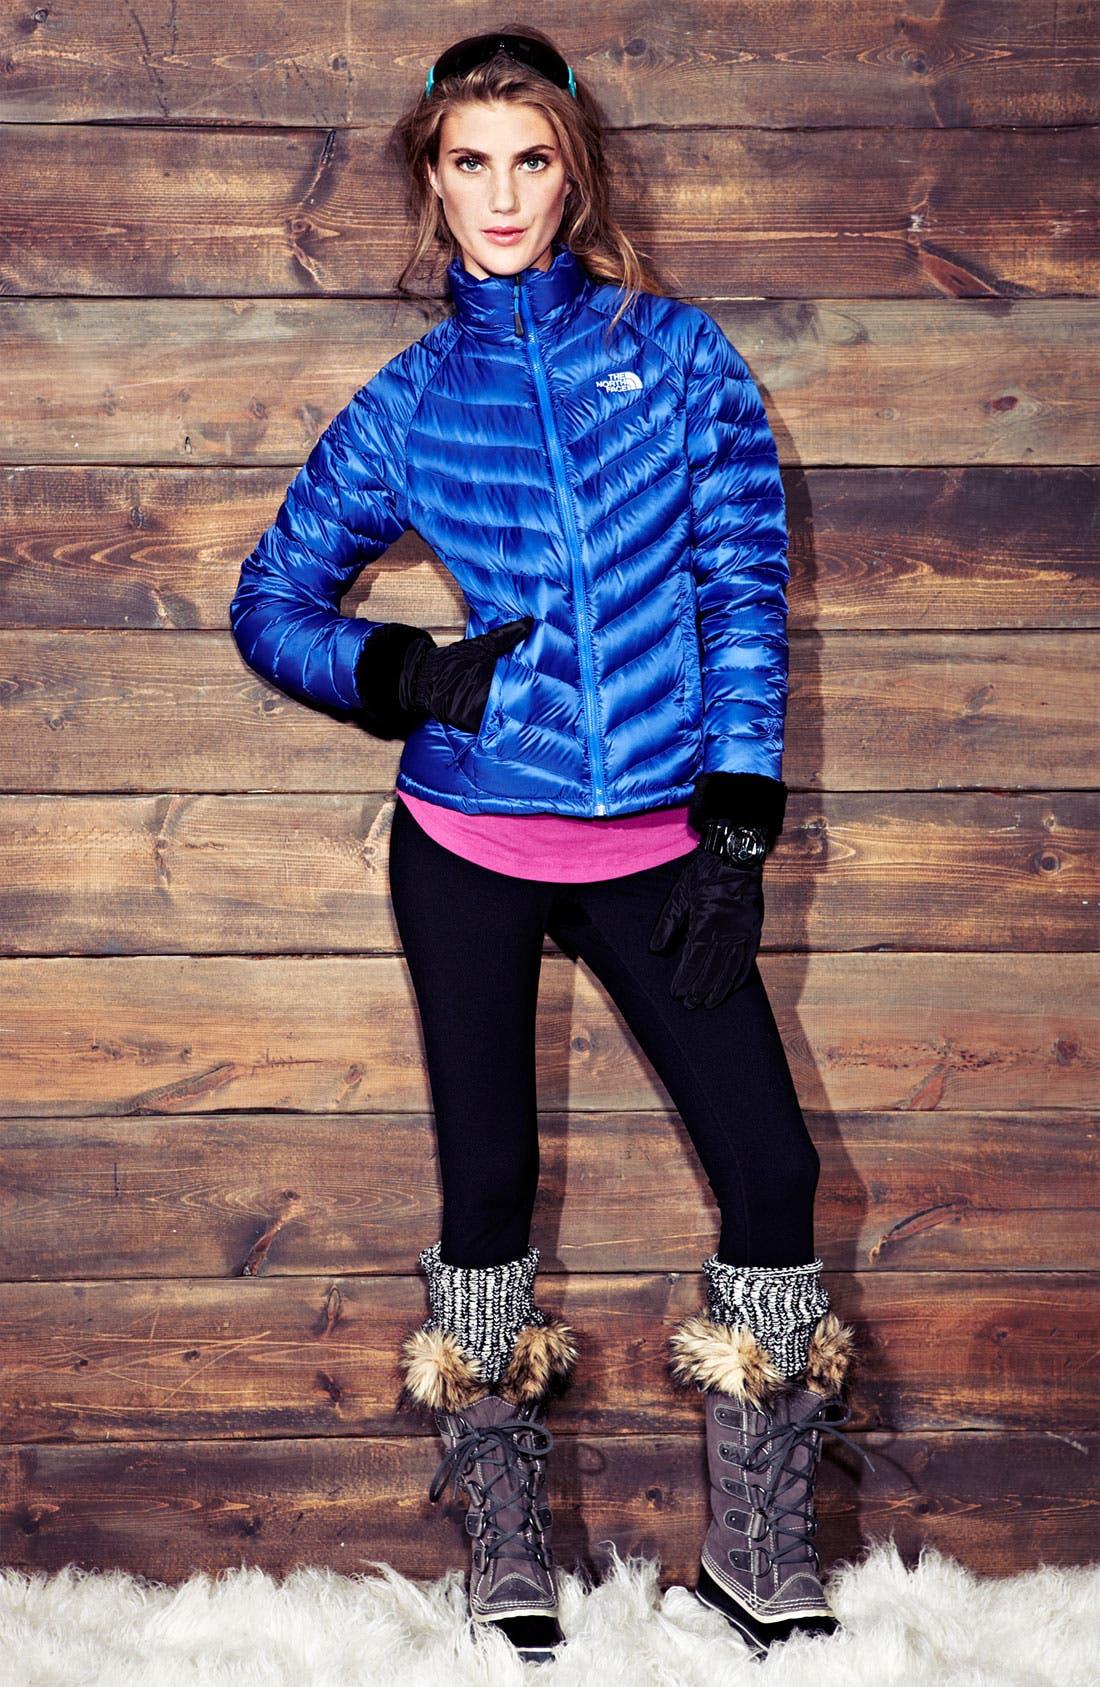 Main Image - The North Face Jacket & Zella Leggings